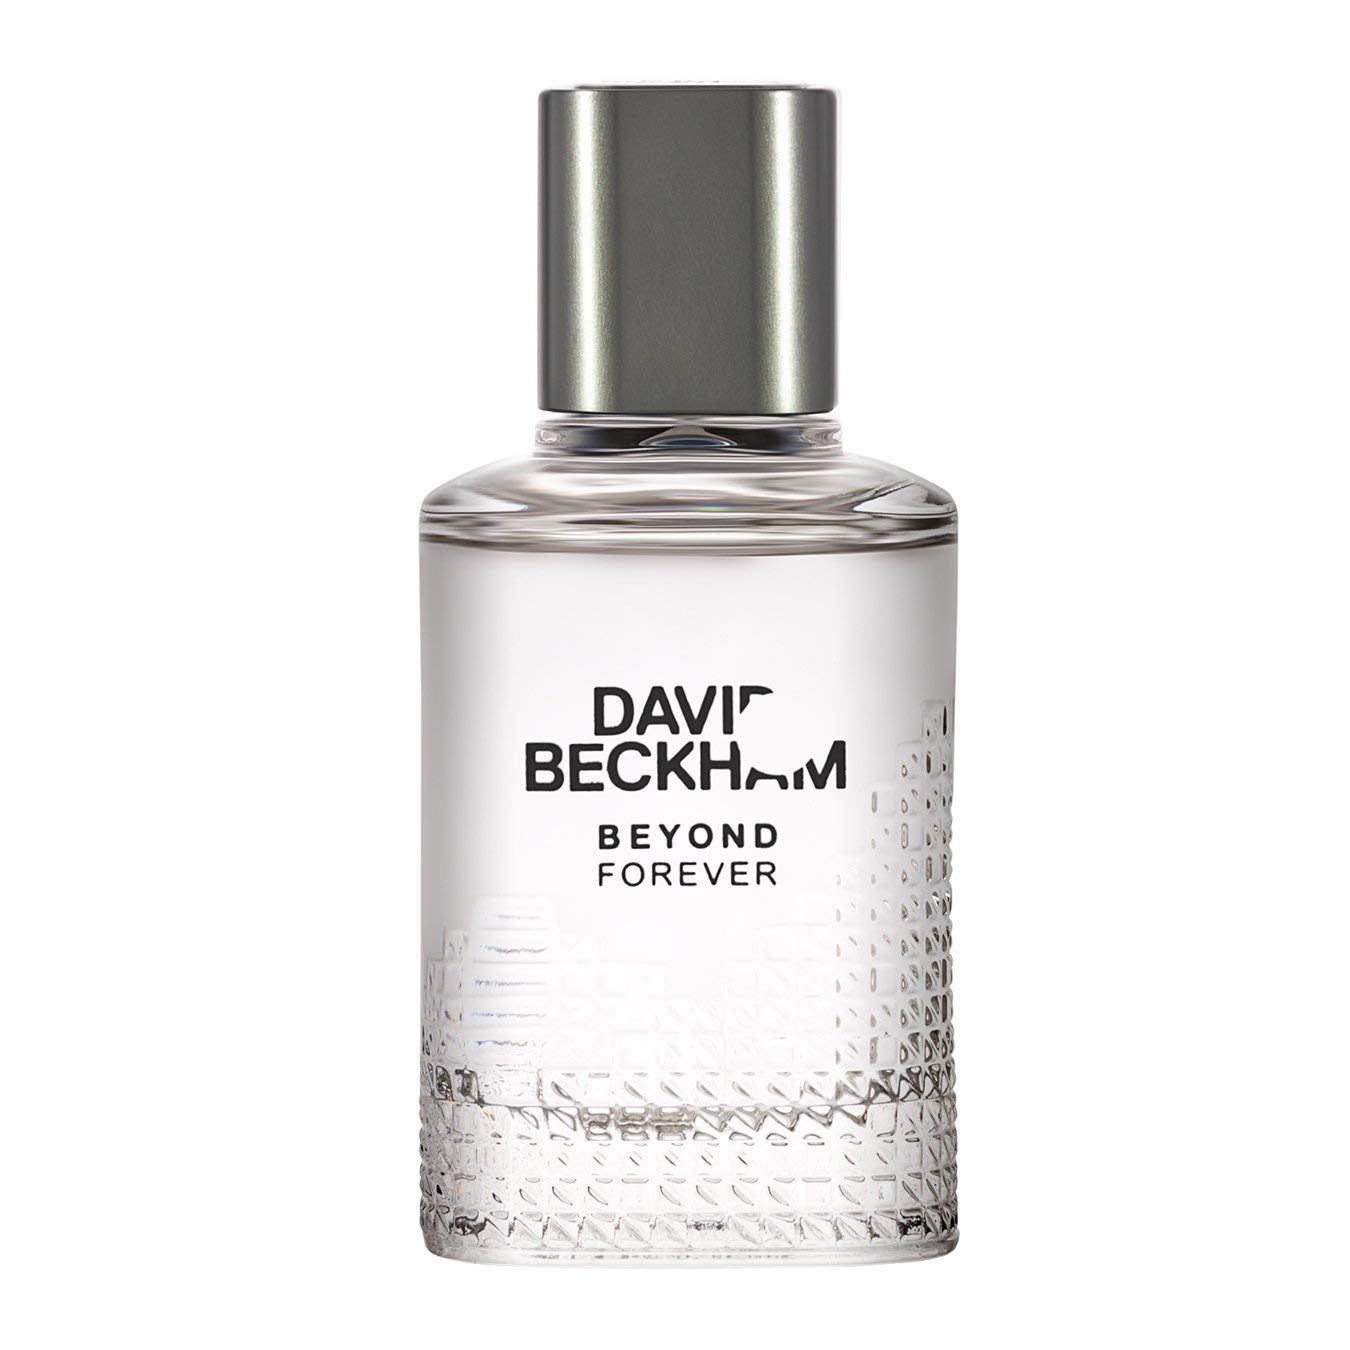 David Beckham Beyond Forever Eau De Toilette Perfume For Men 40ml